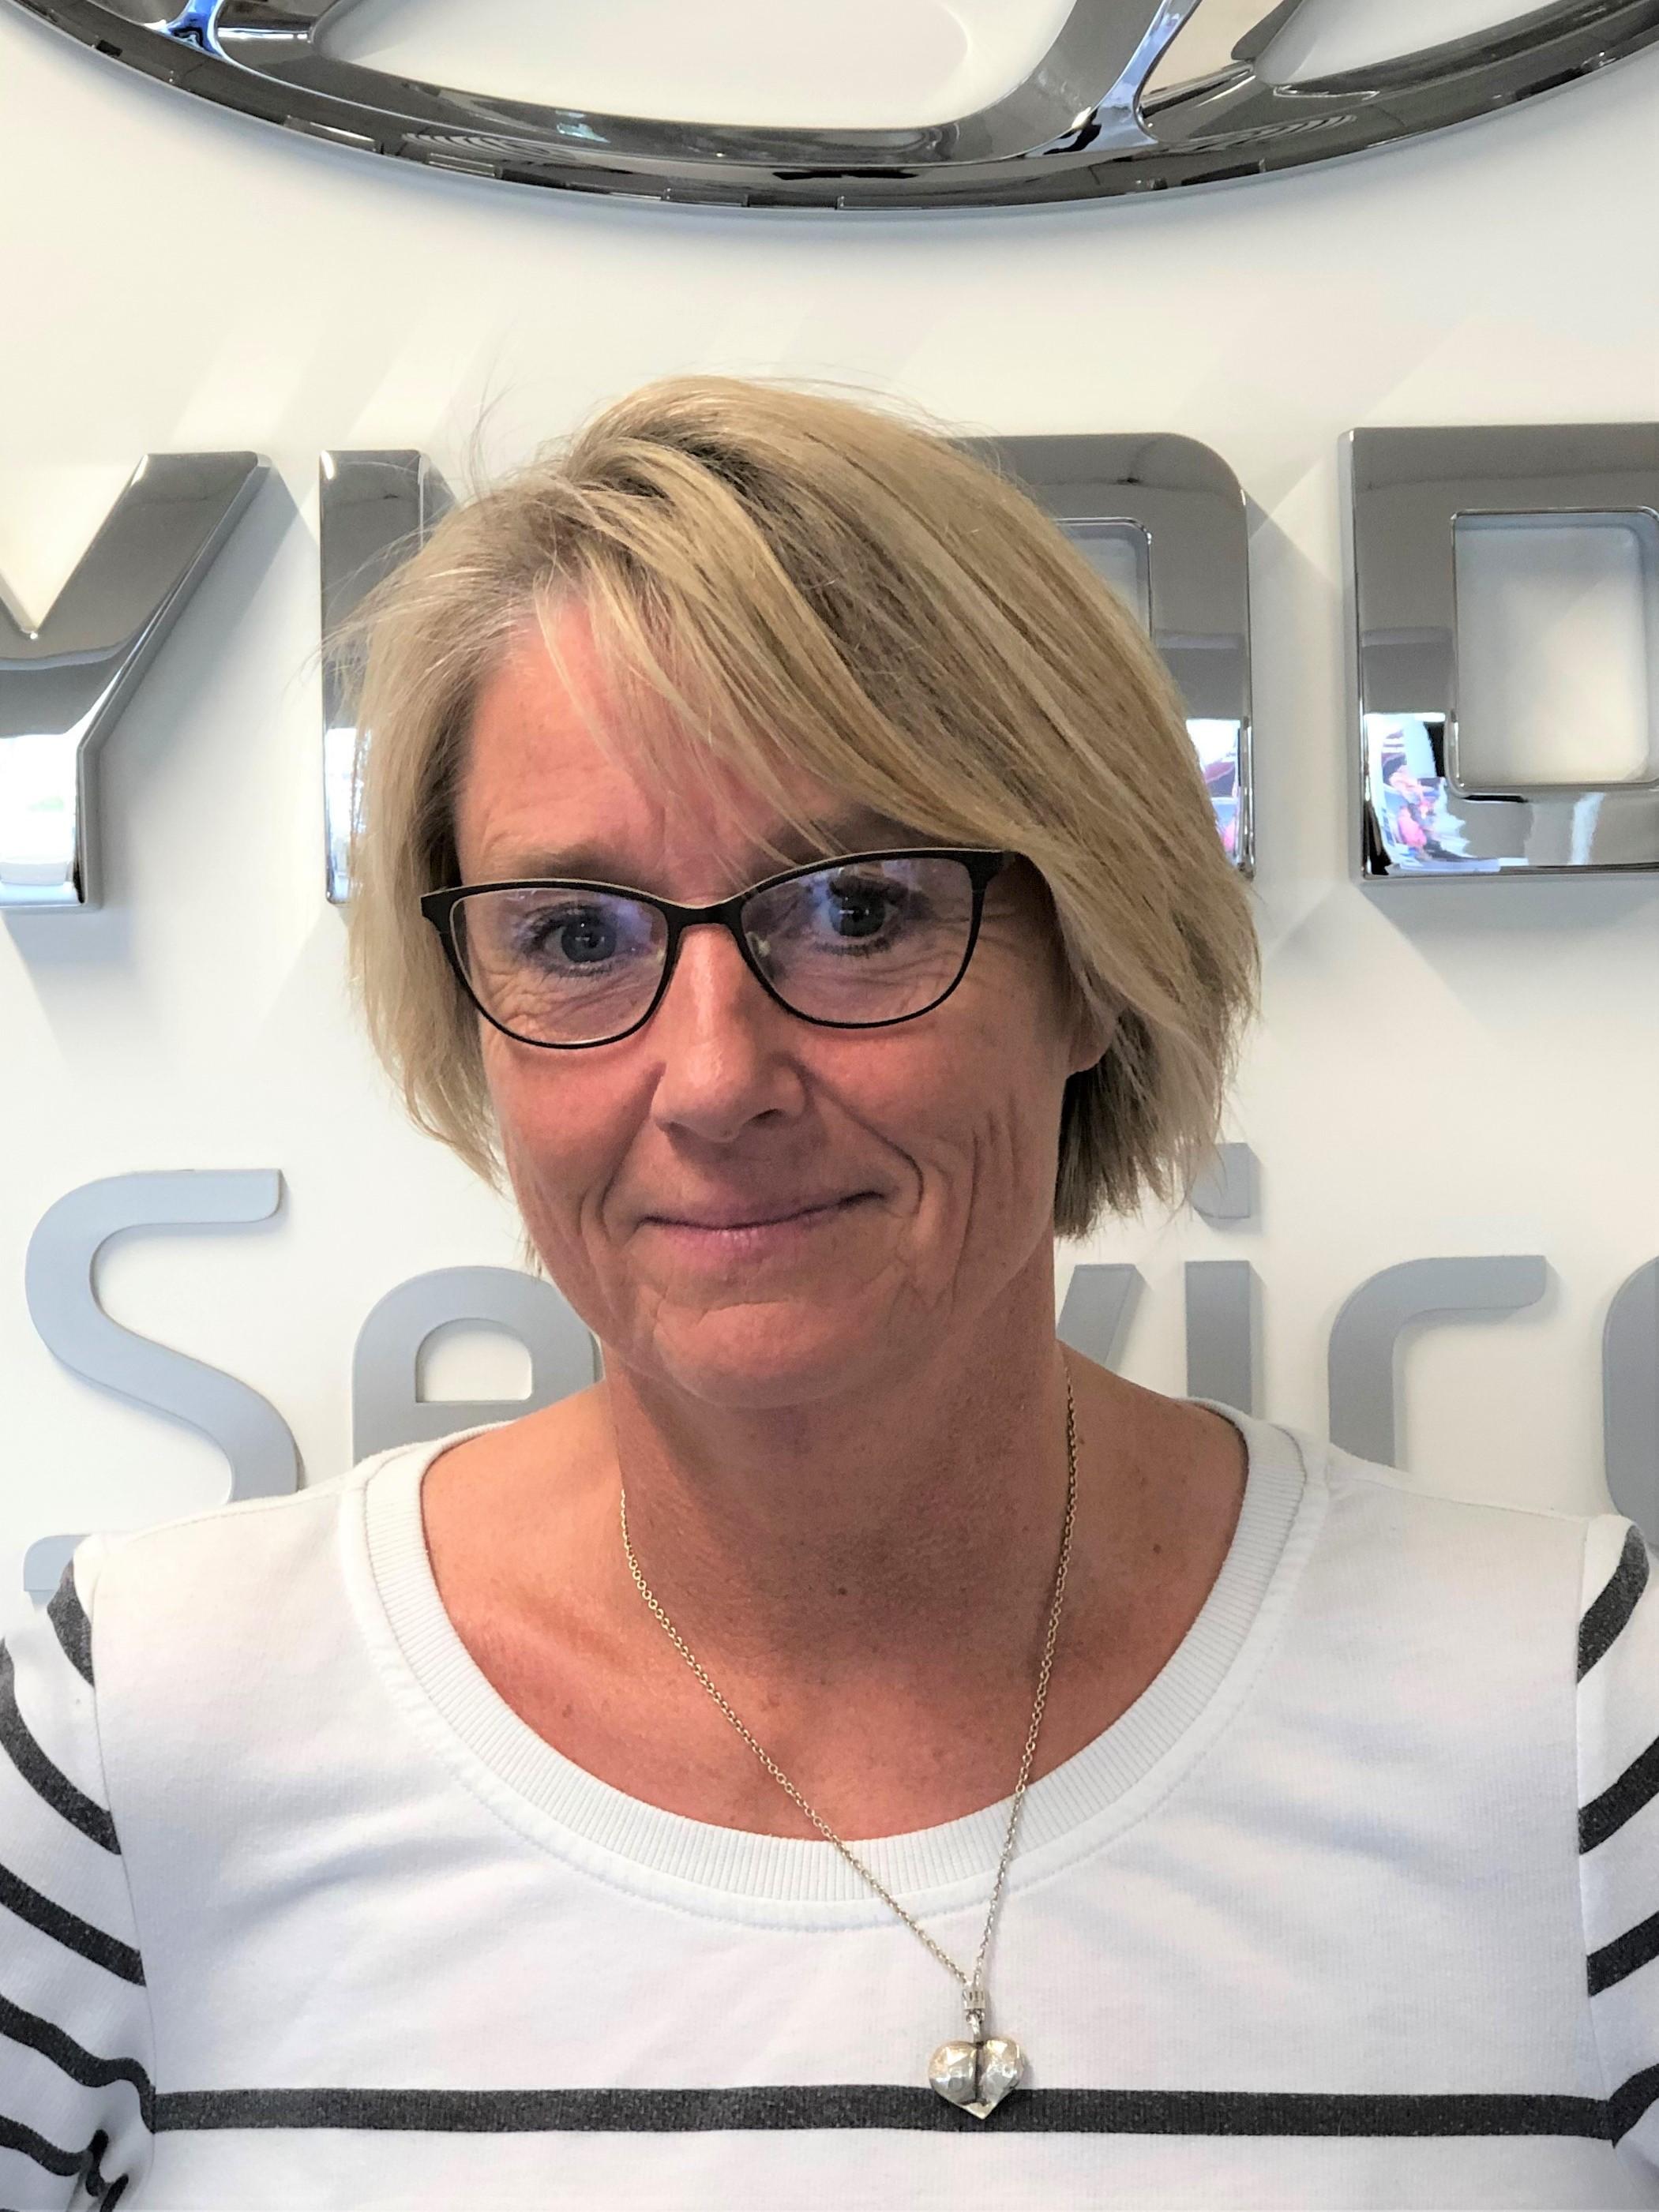 Tina Wittorff Hasfeldt